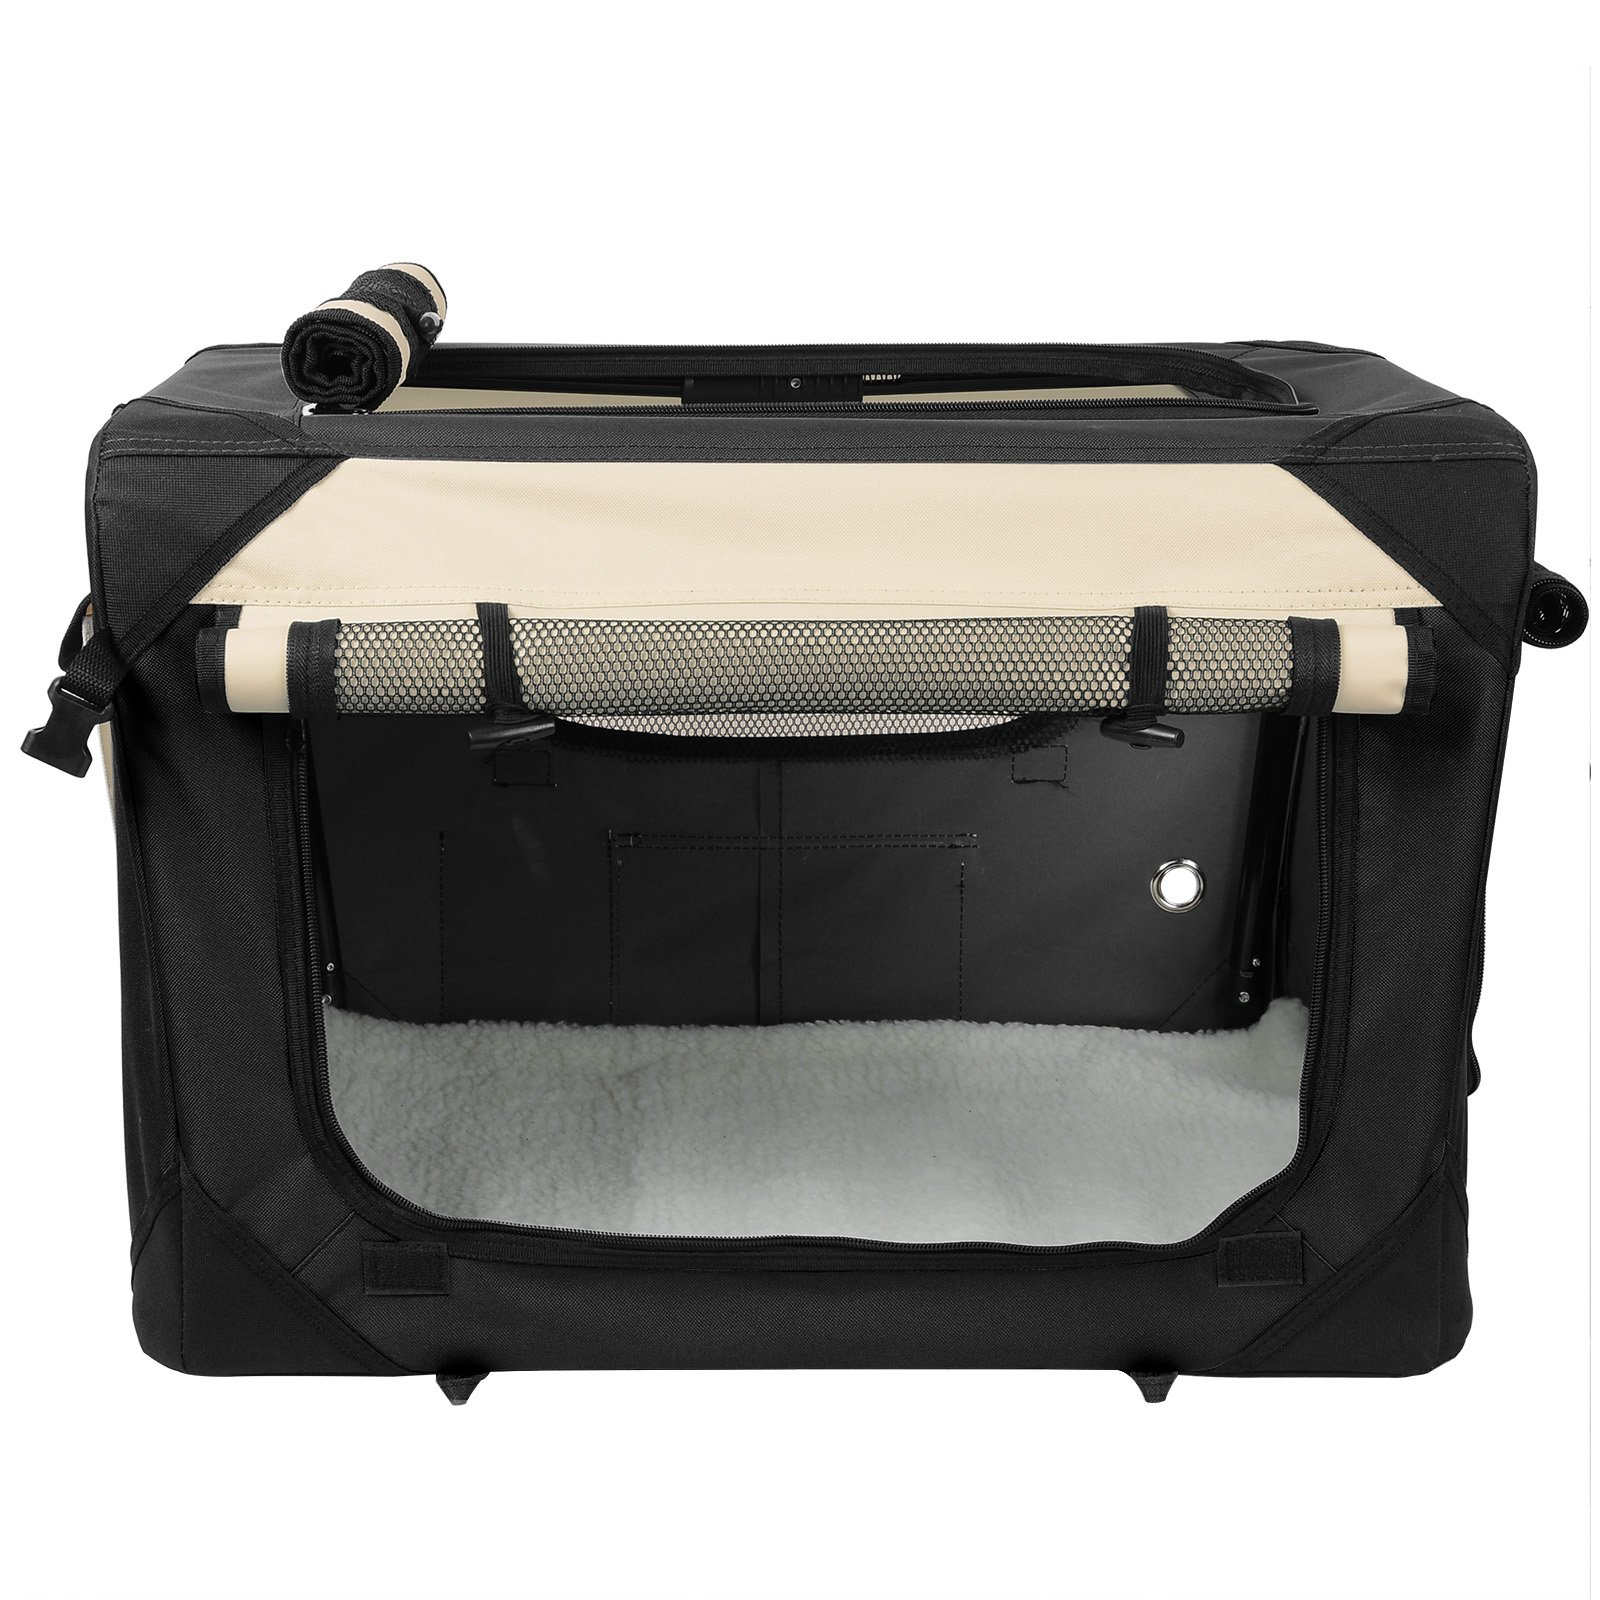 WOLTU Premium Soft Sided Pet Carrier Foldable Pet Travel Crate, Black+Beige, PCS01blkS4-a by WOLTU (Image #2)